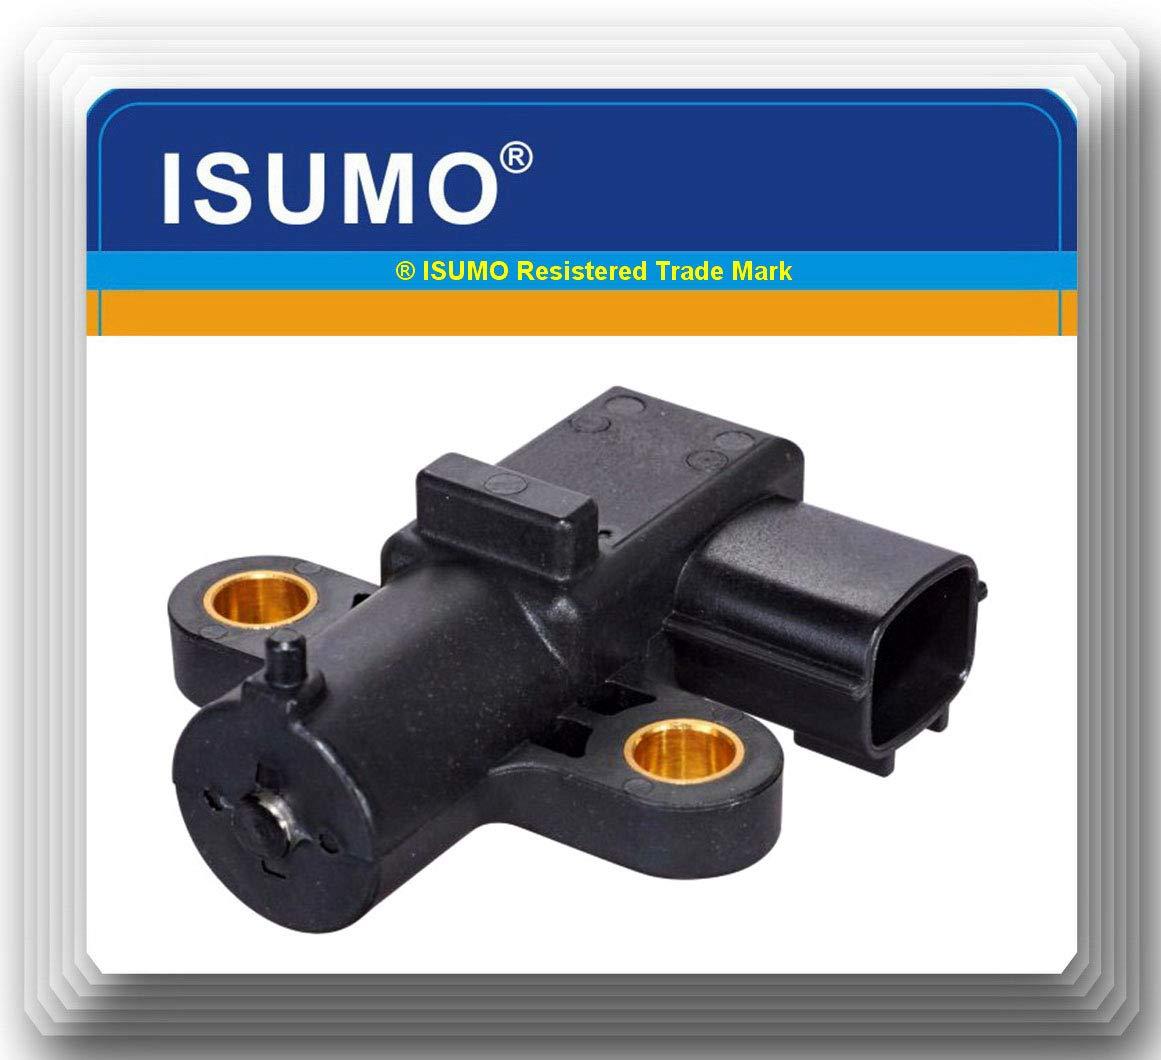 23731-31U11 Engine Crankshaft Position Sensor With Electrical Connector Front Fits INFINITI I30 1996-2001 INFINITI QX4 2001-2003 NISSAN MAXIMA 1995-2002 NISSAN PATHFINDER 2001-2002